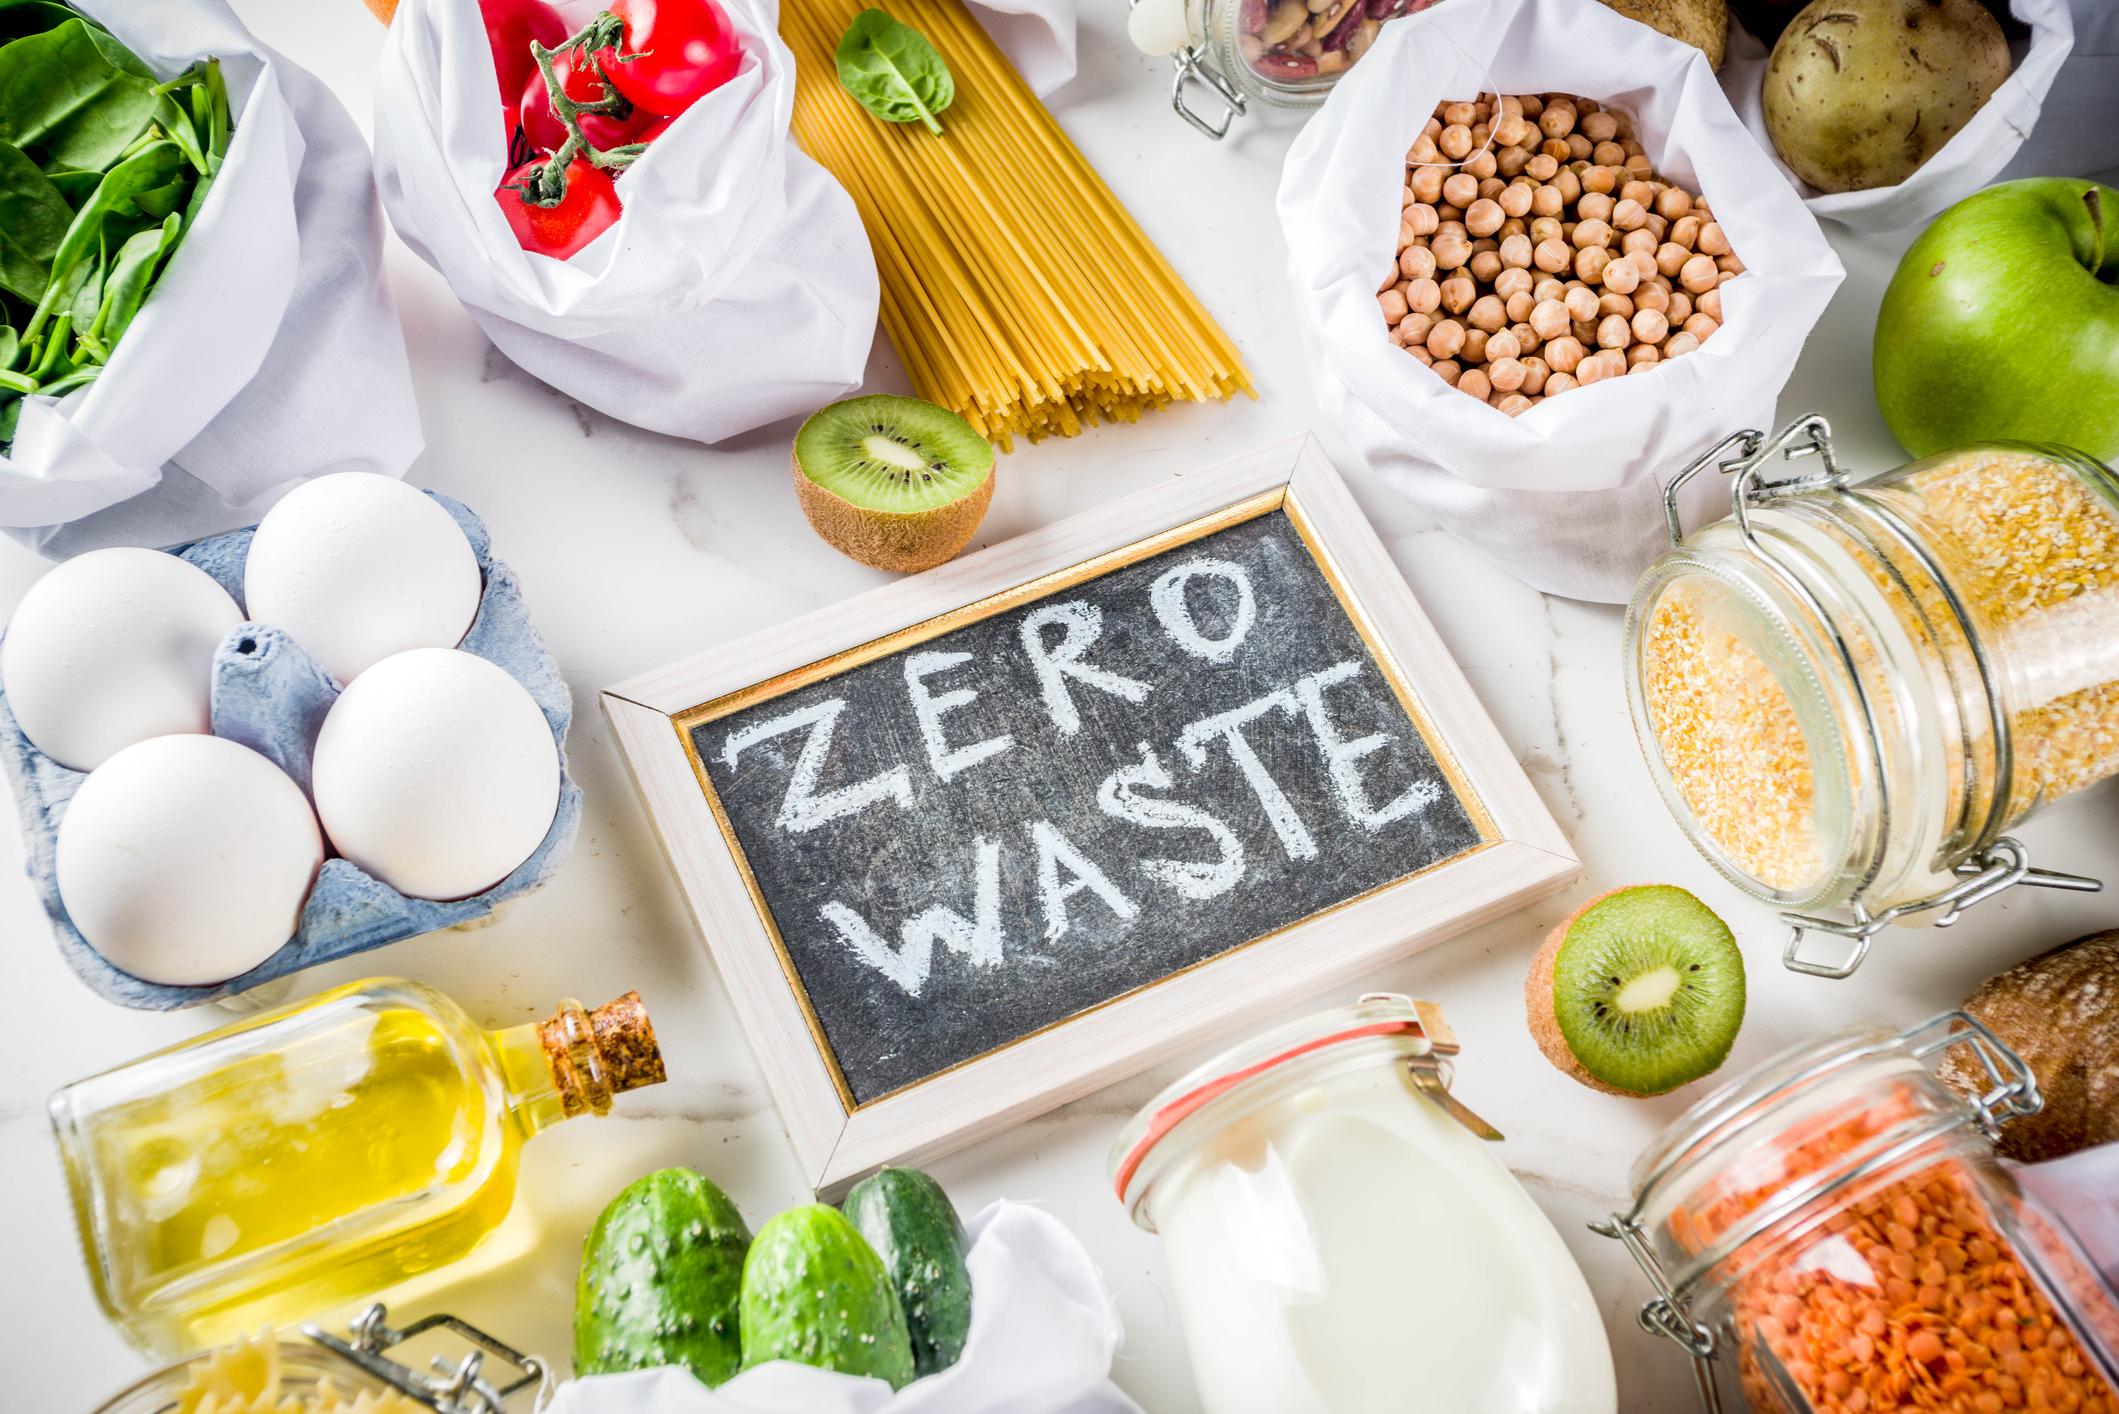 zero food waste banner with surrounding food